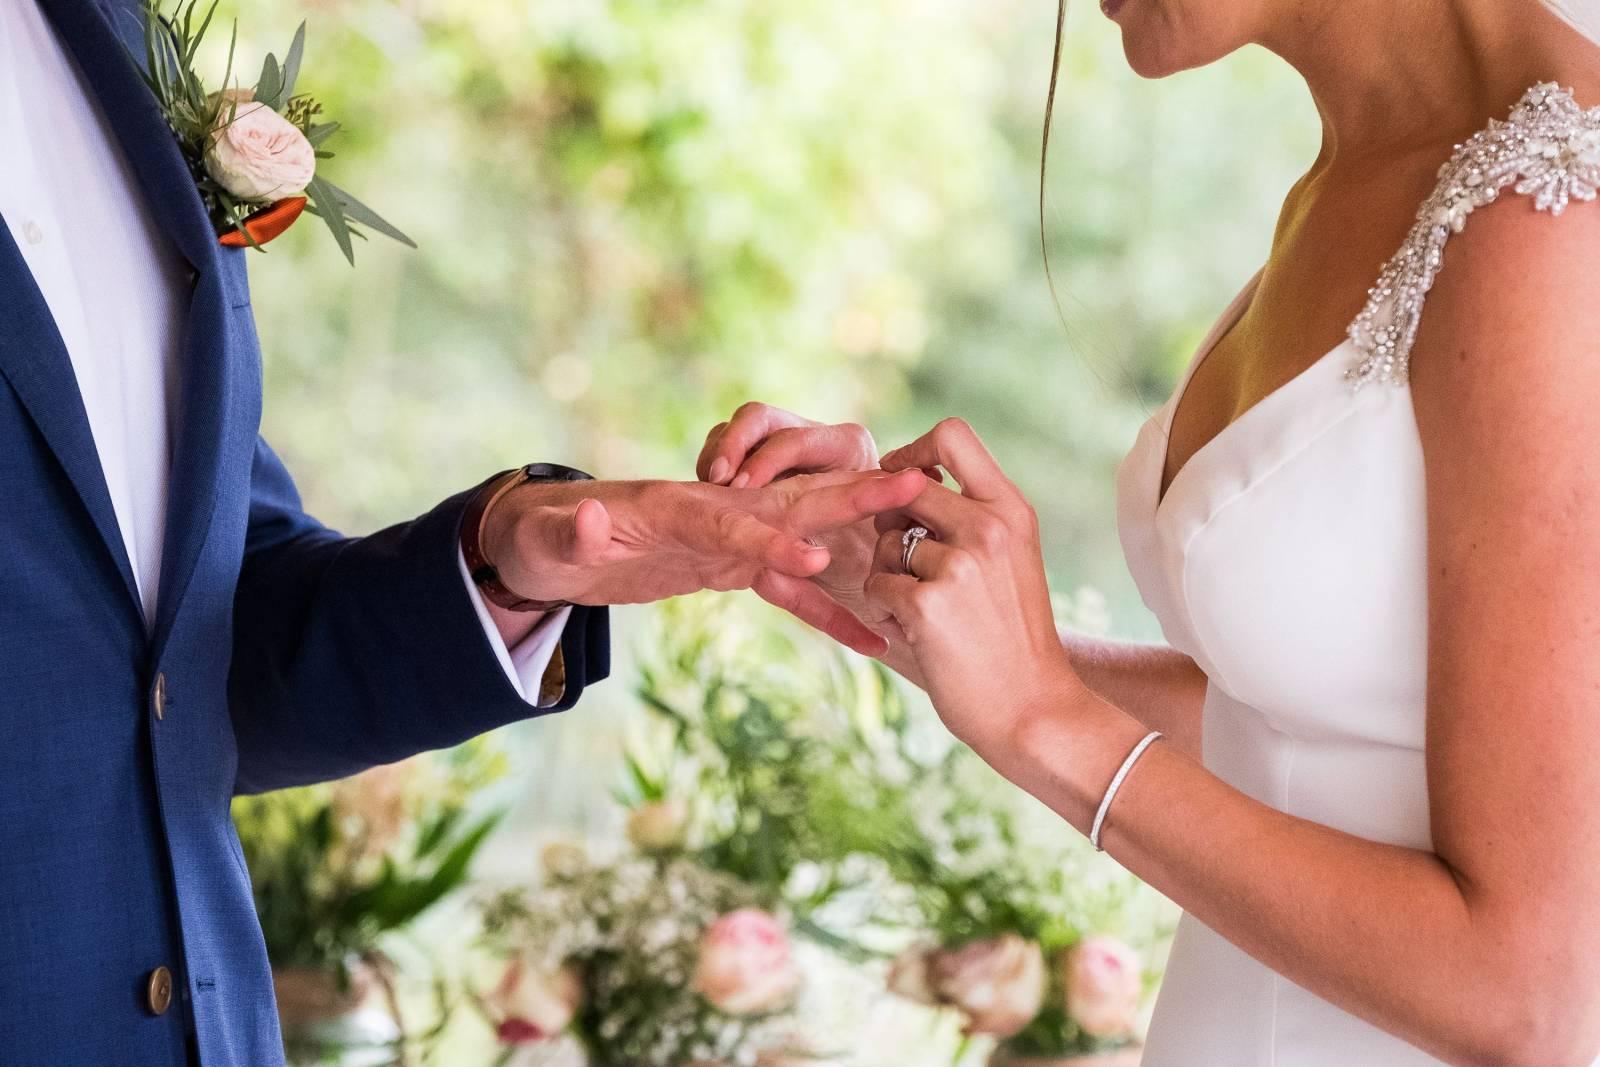 Lauren Bracke - Bruidsmake-up - Bruidskapsel - Nagels - House of Weddings - 2